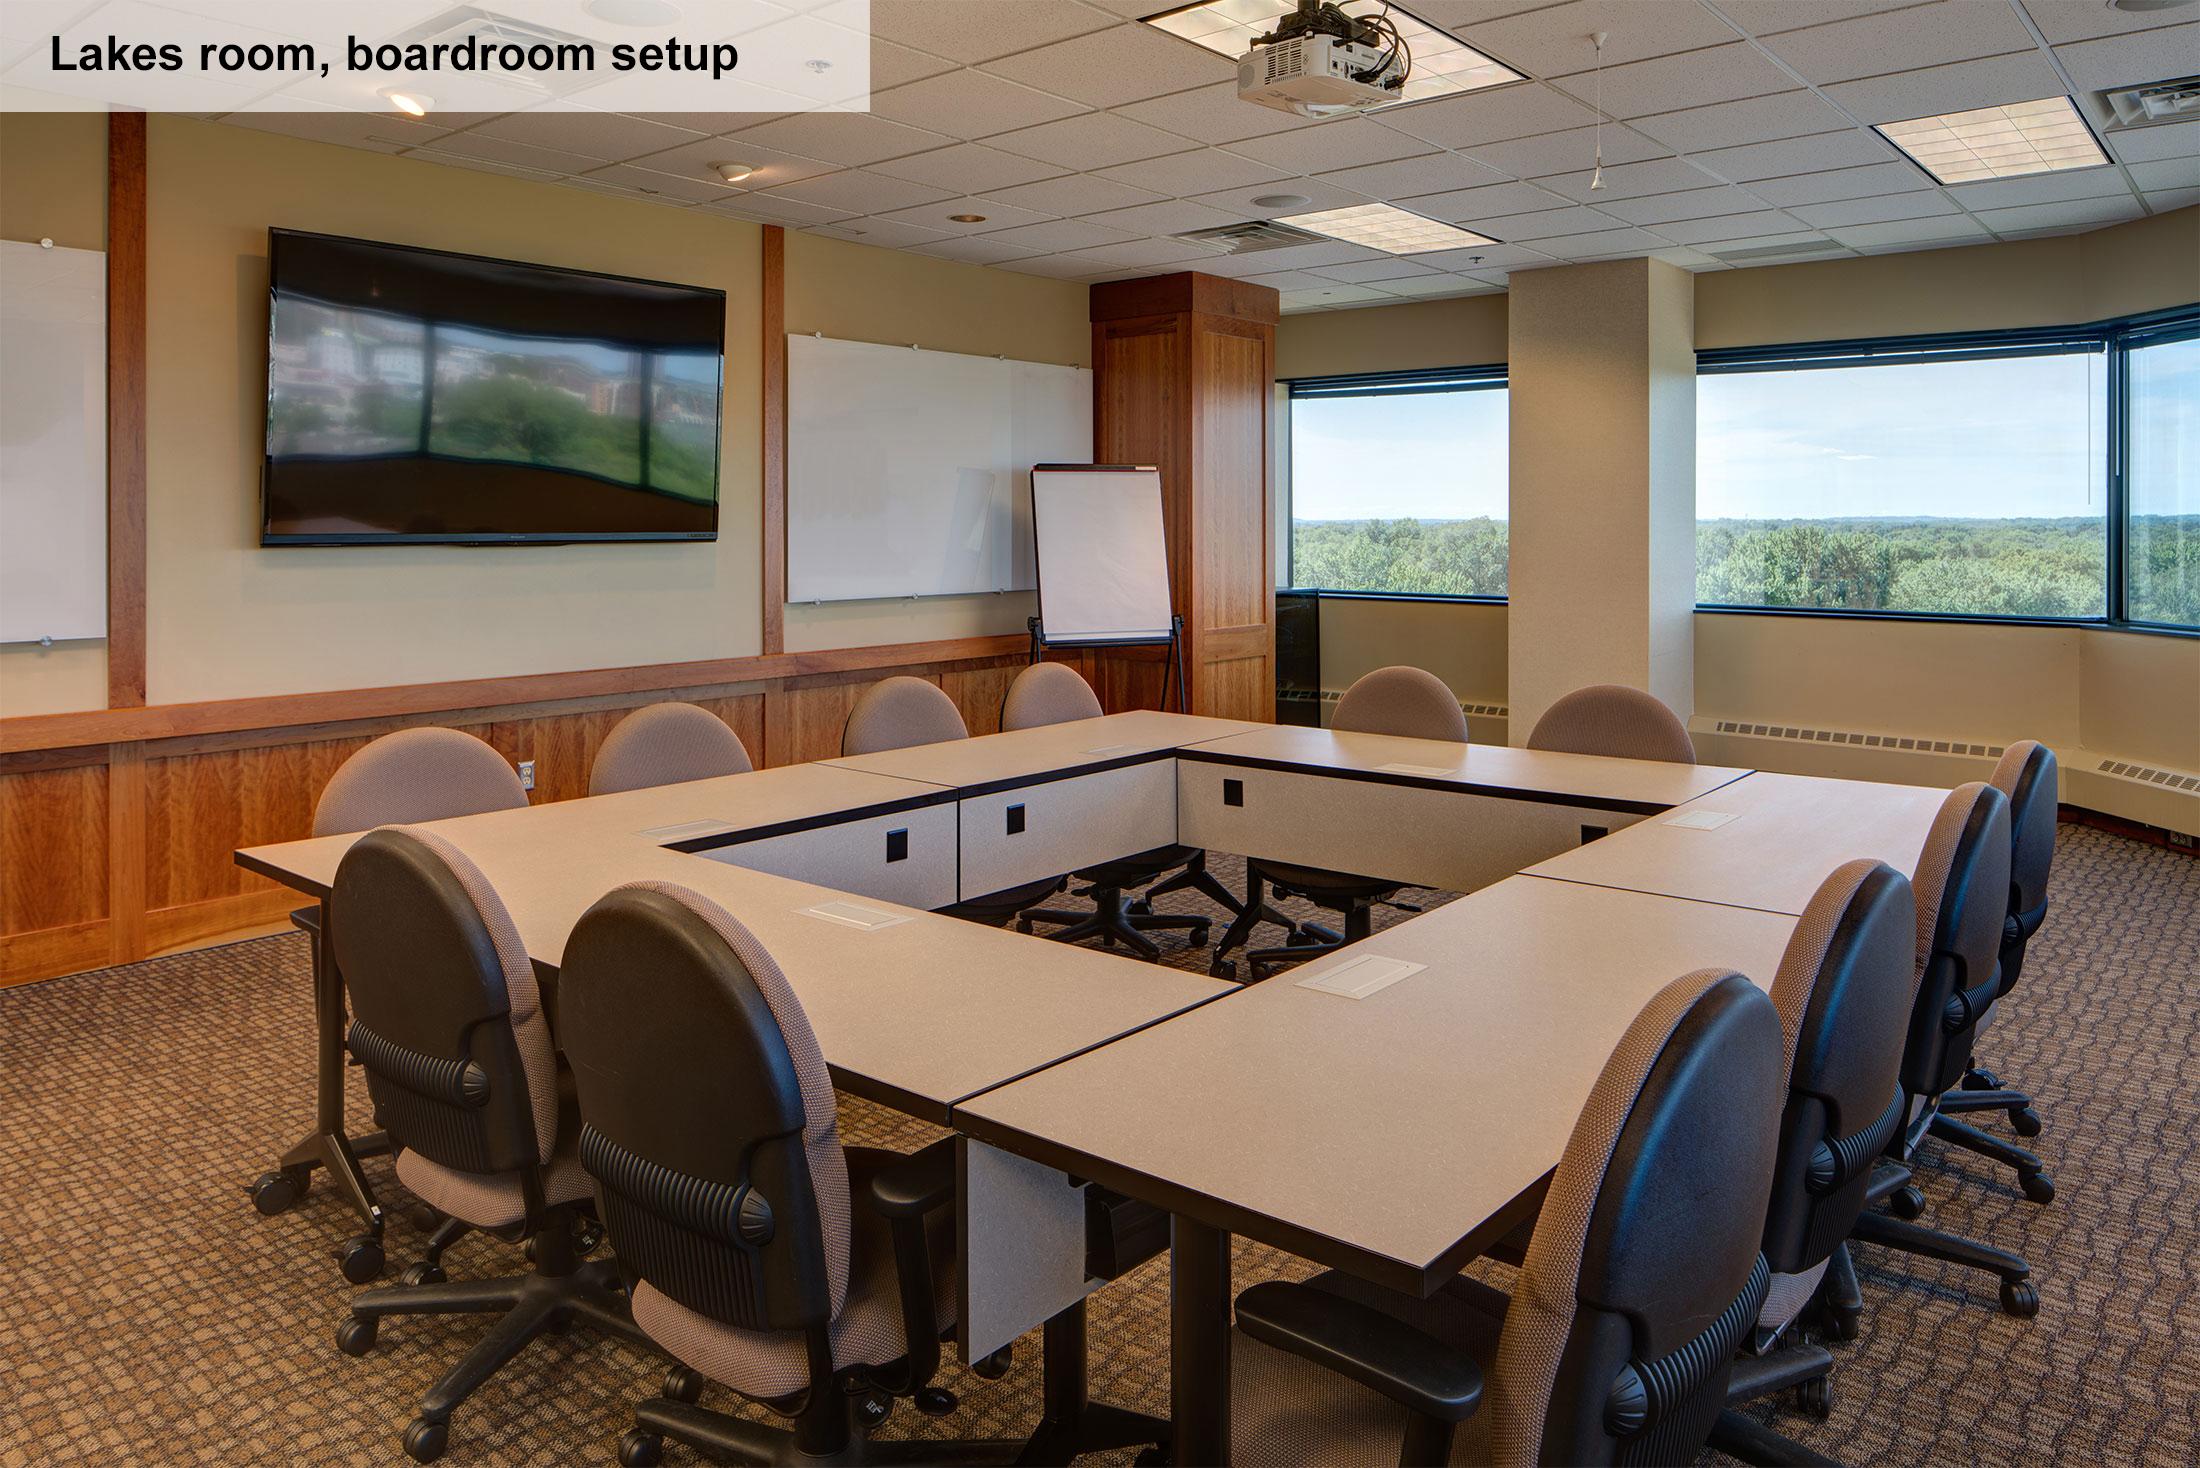 Meeting Room for 25: Classroom Rental in Bloomington, MN